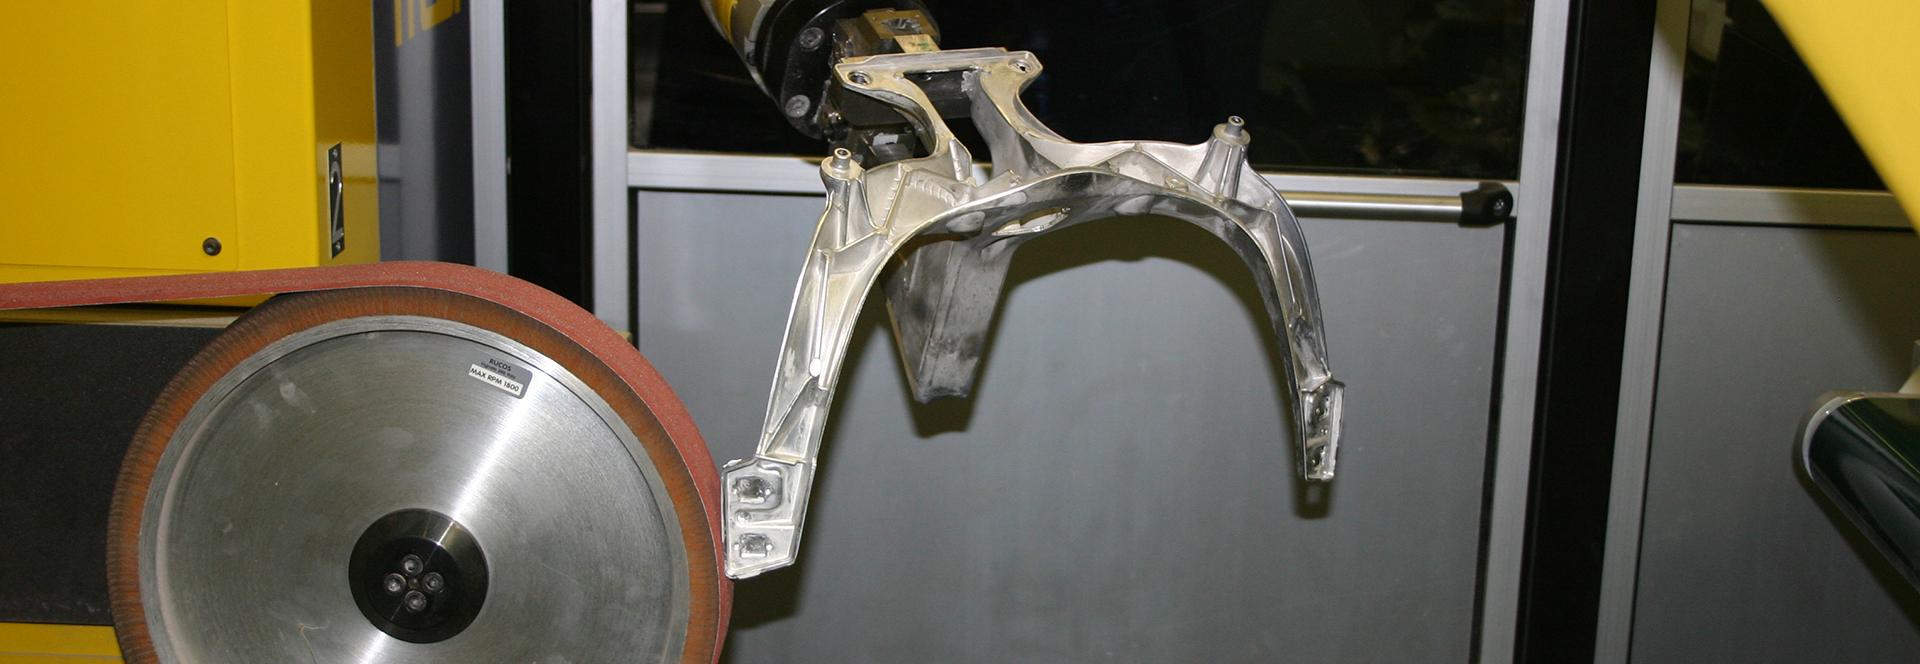 BMT Pulitura Metalli - Smerigliatura Metalli